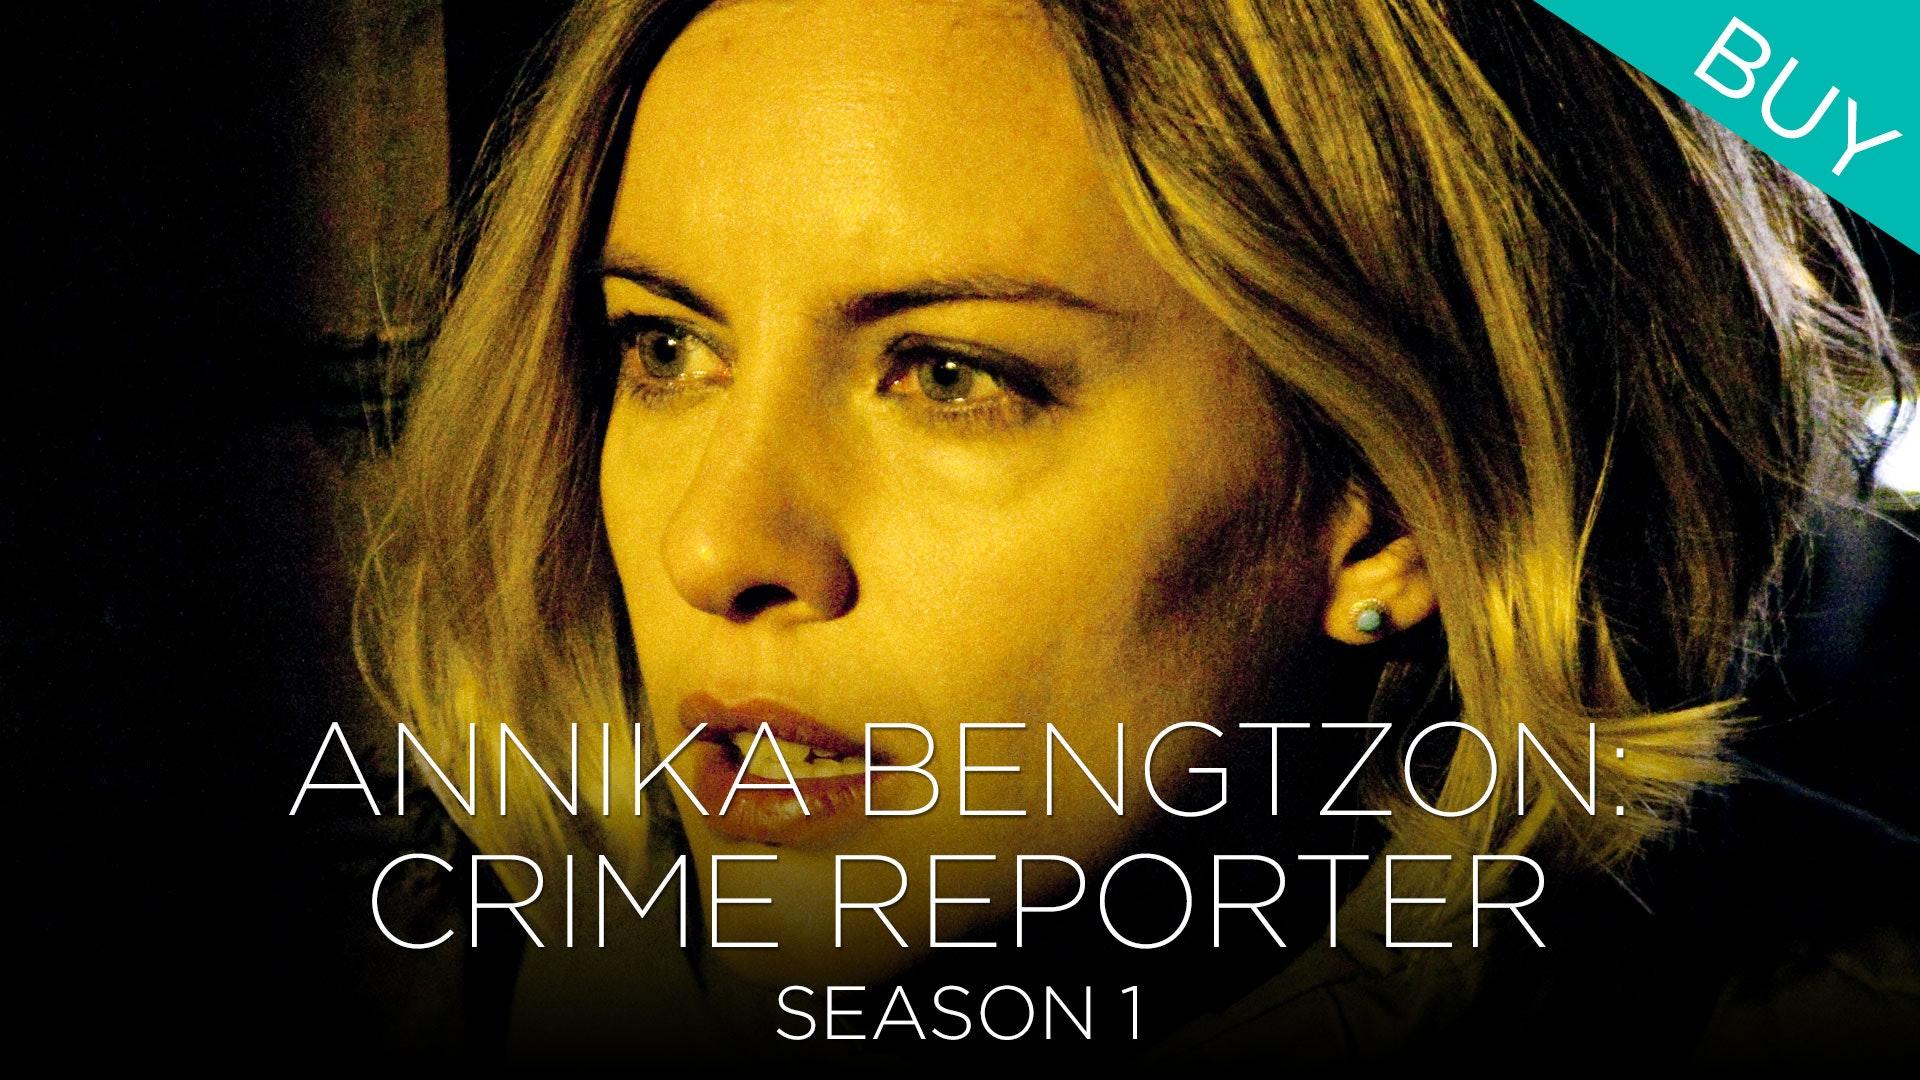 annika bengtzon crime reporter season 1 mhz choice